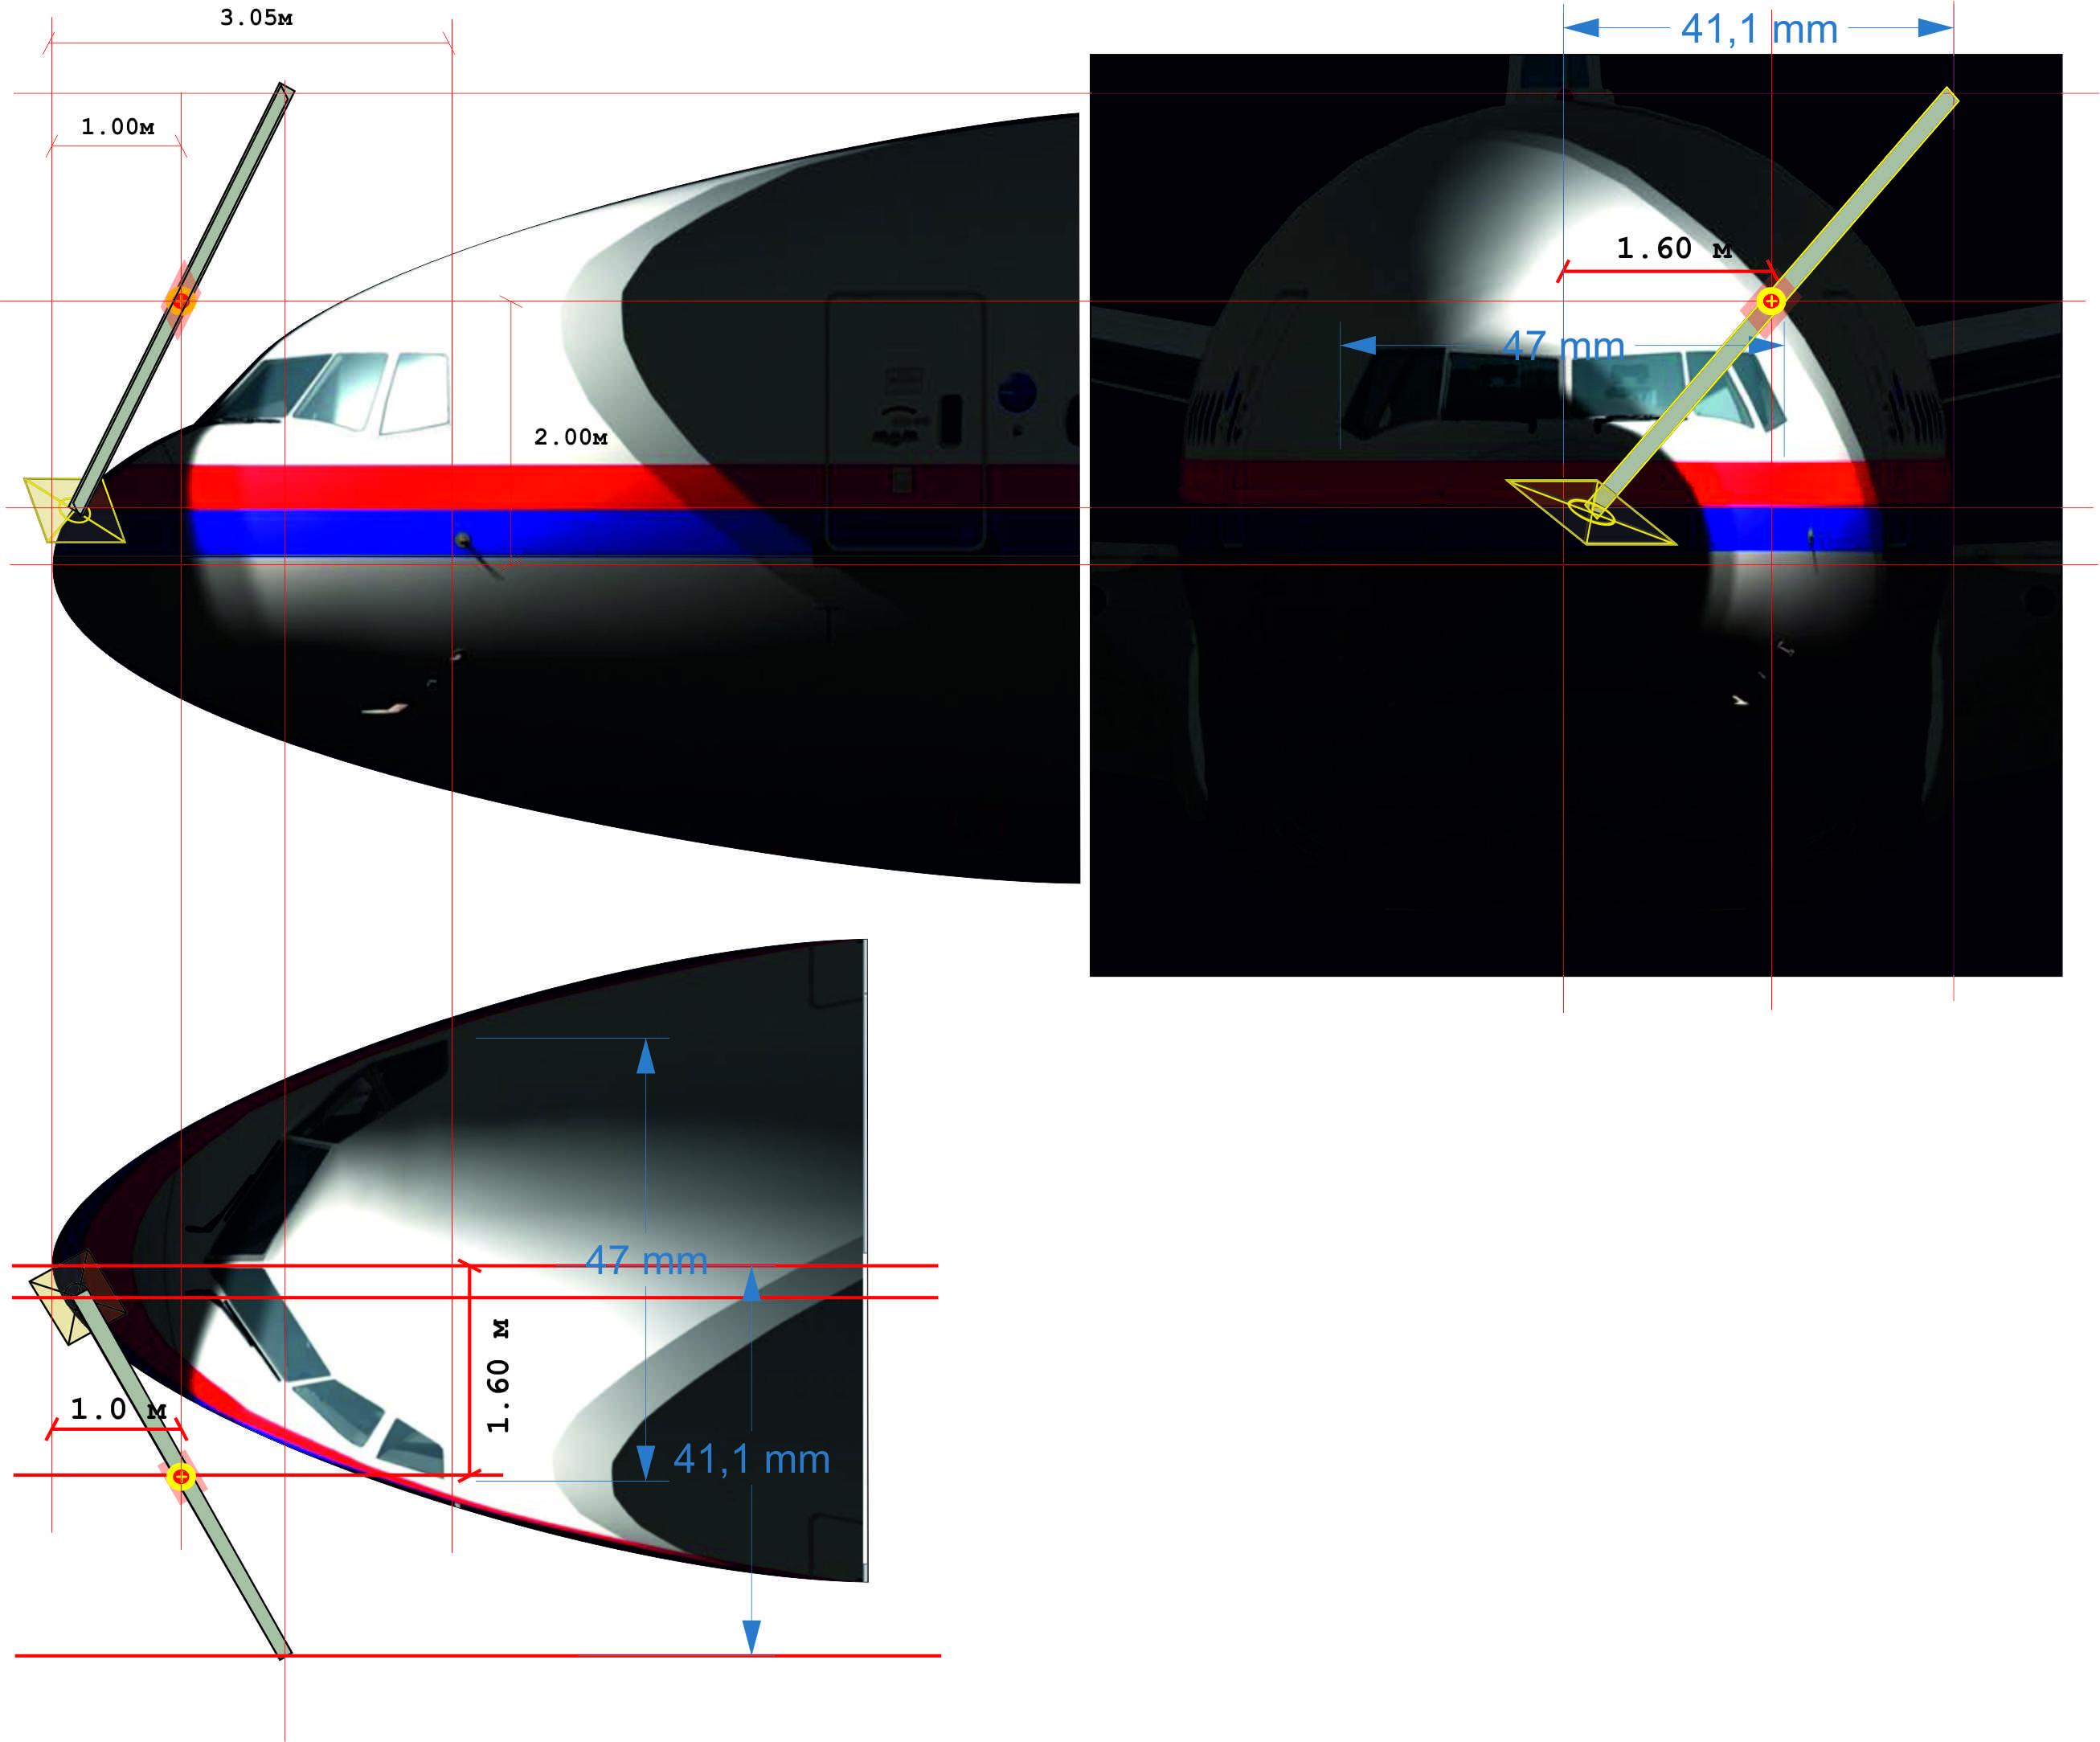 http://images.vfl.ru/ii/1609344725/b194a354/32818891.jpg